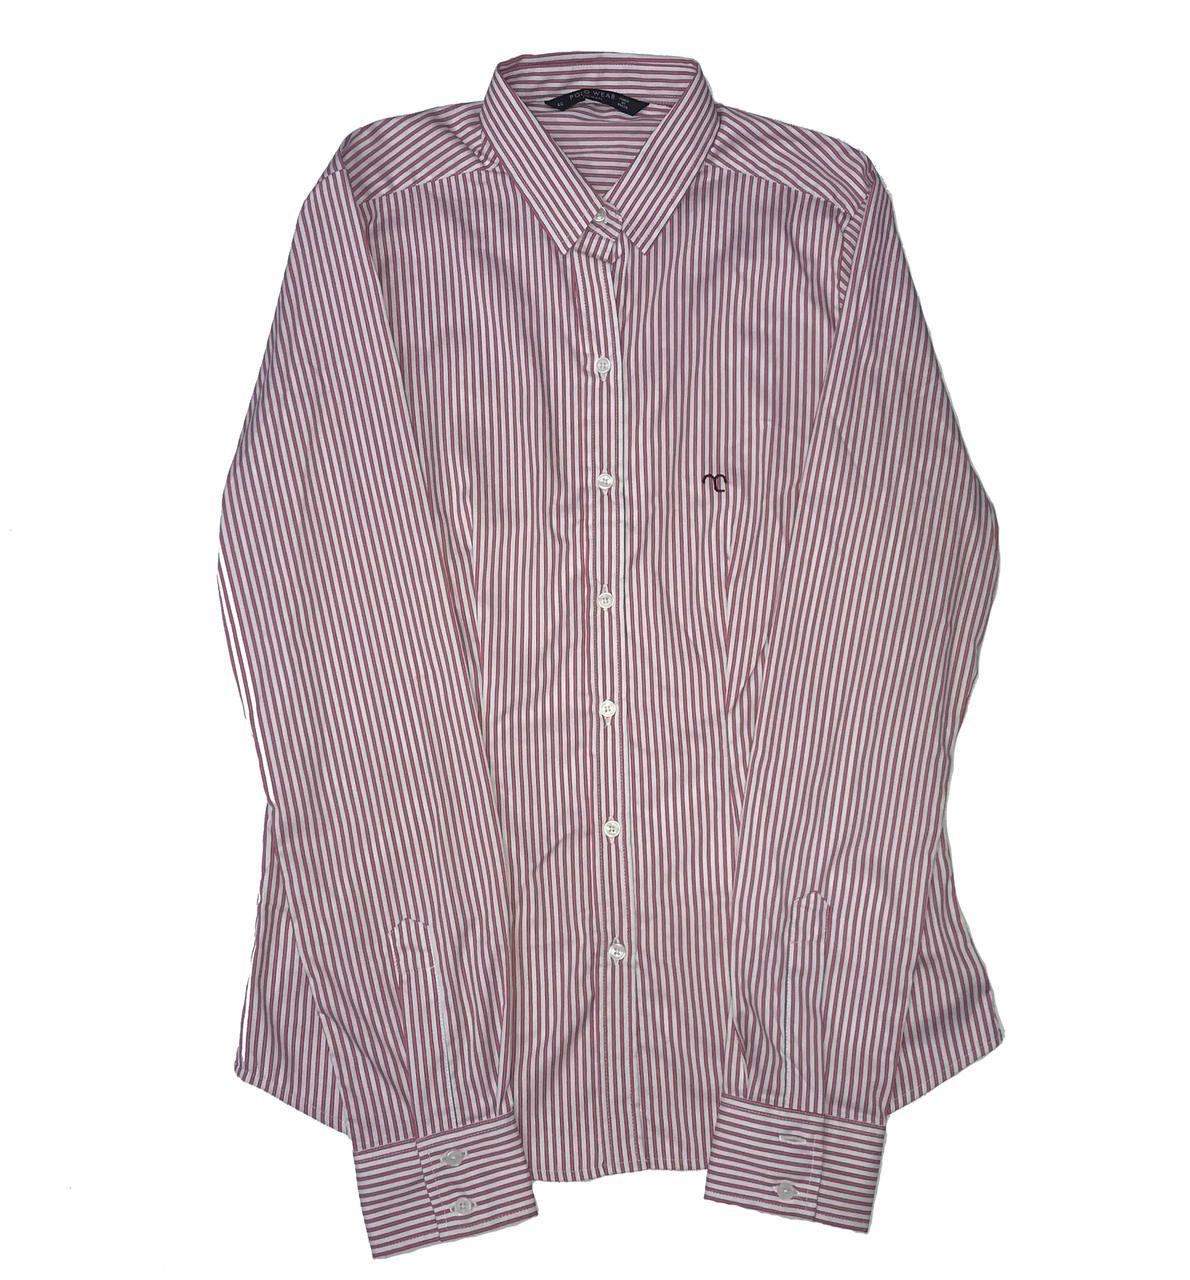 Camisa Social Feminina Listrada ML  - Boutique Mangalarga